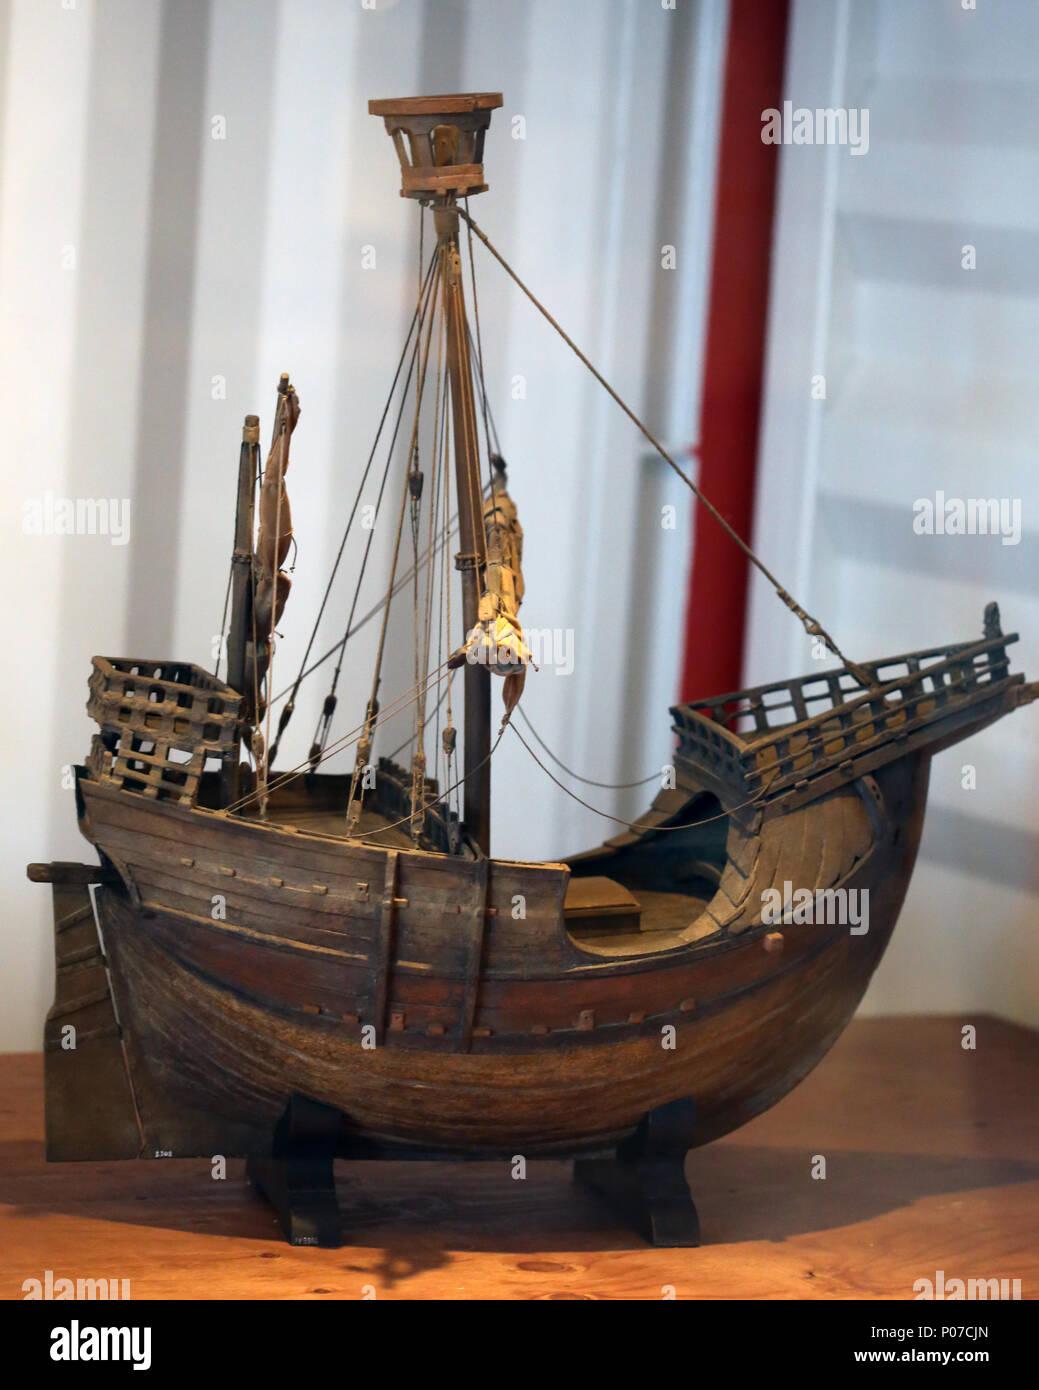 Coca of Mataro. Cocche votive model, Mediterranean adaptation of cog. 15th cent. Maritime Museum of Barcelona. Spain. - Stock Image